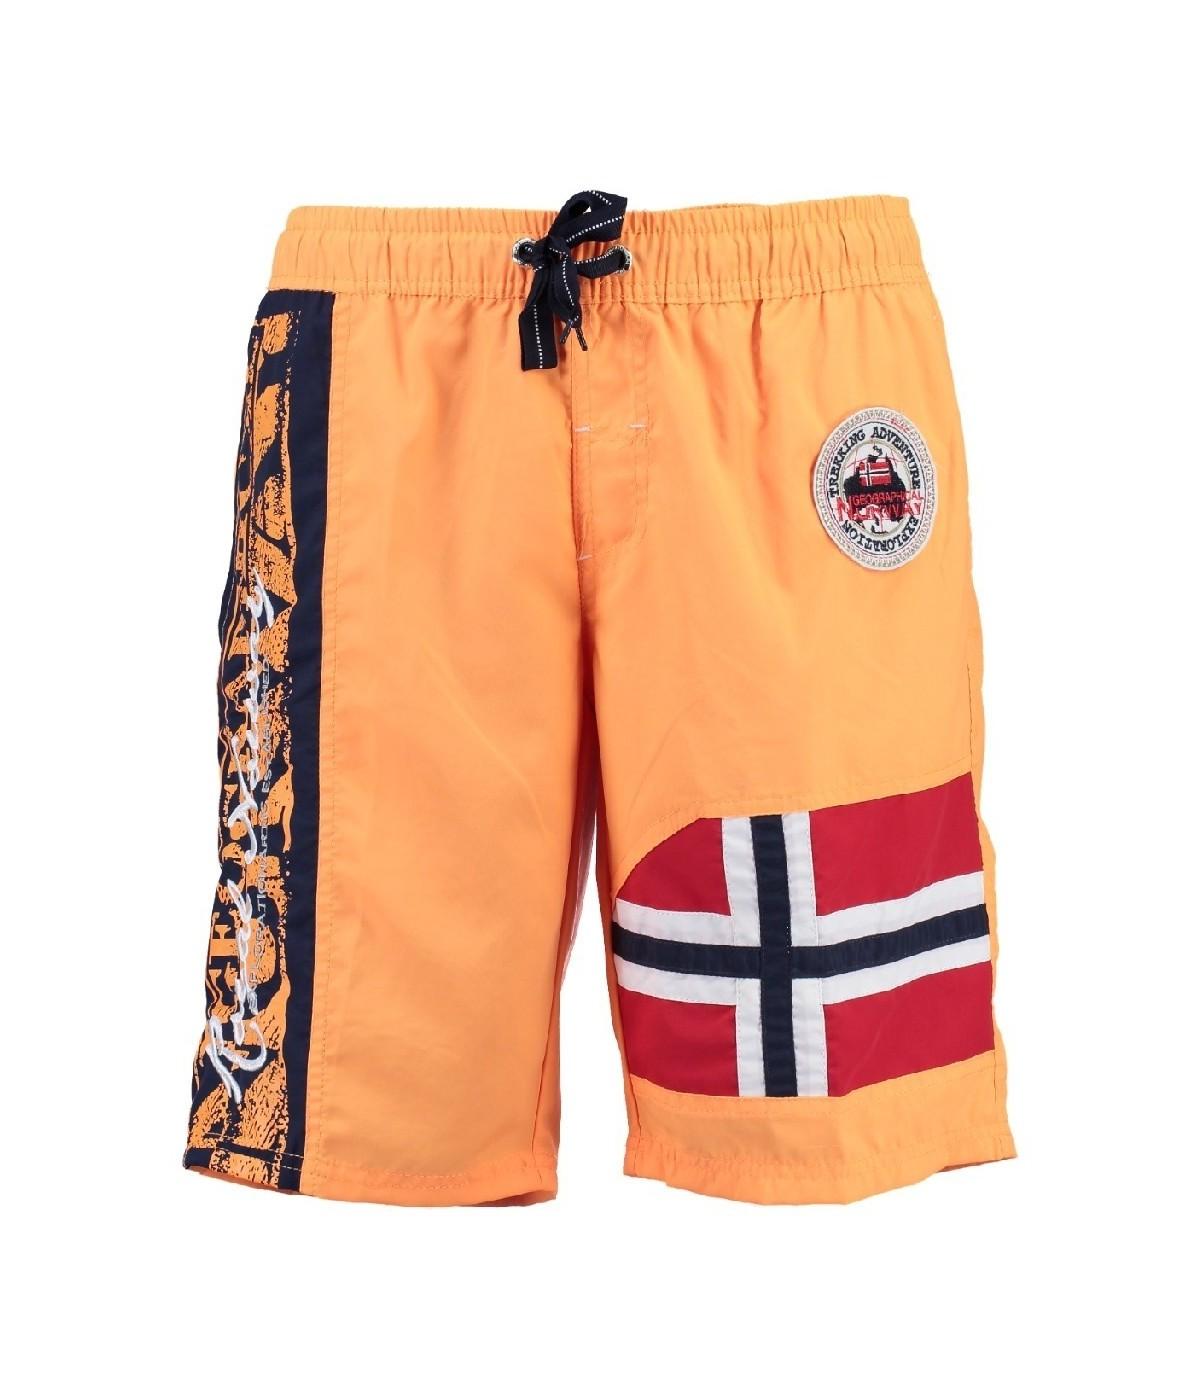 Maillot de Bain Garà§on Geographical Norway Quemen Orange